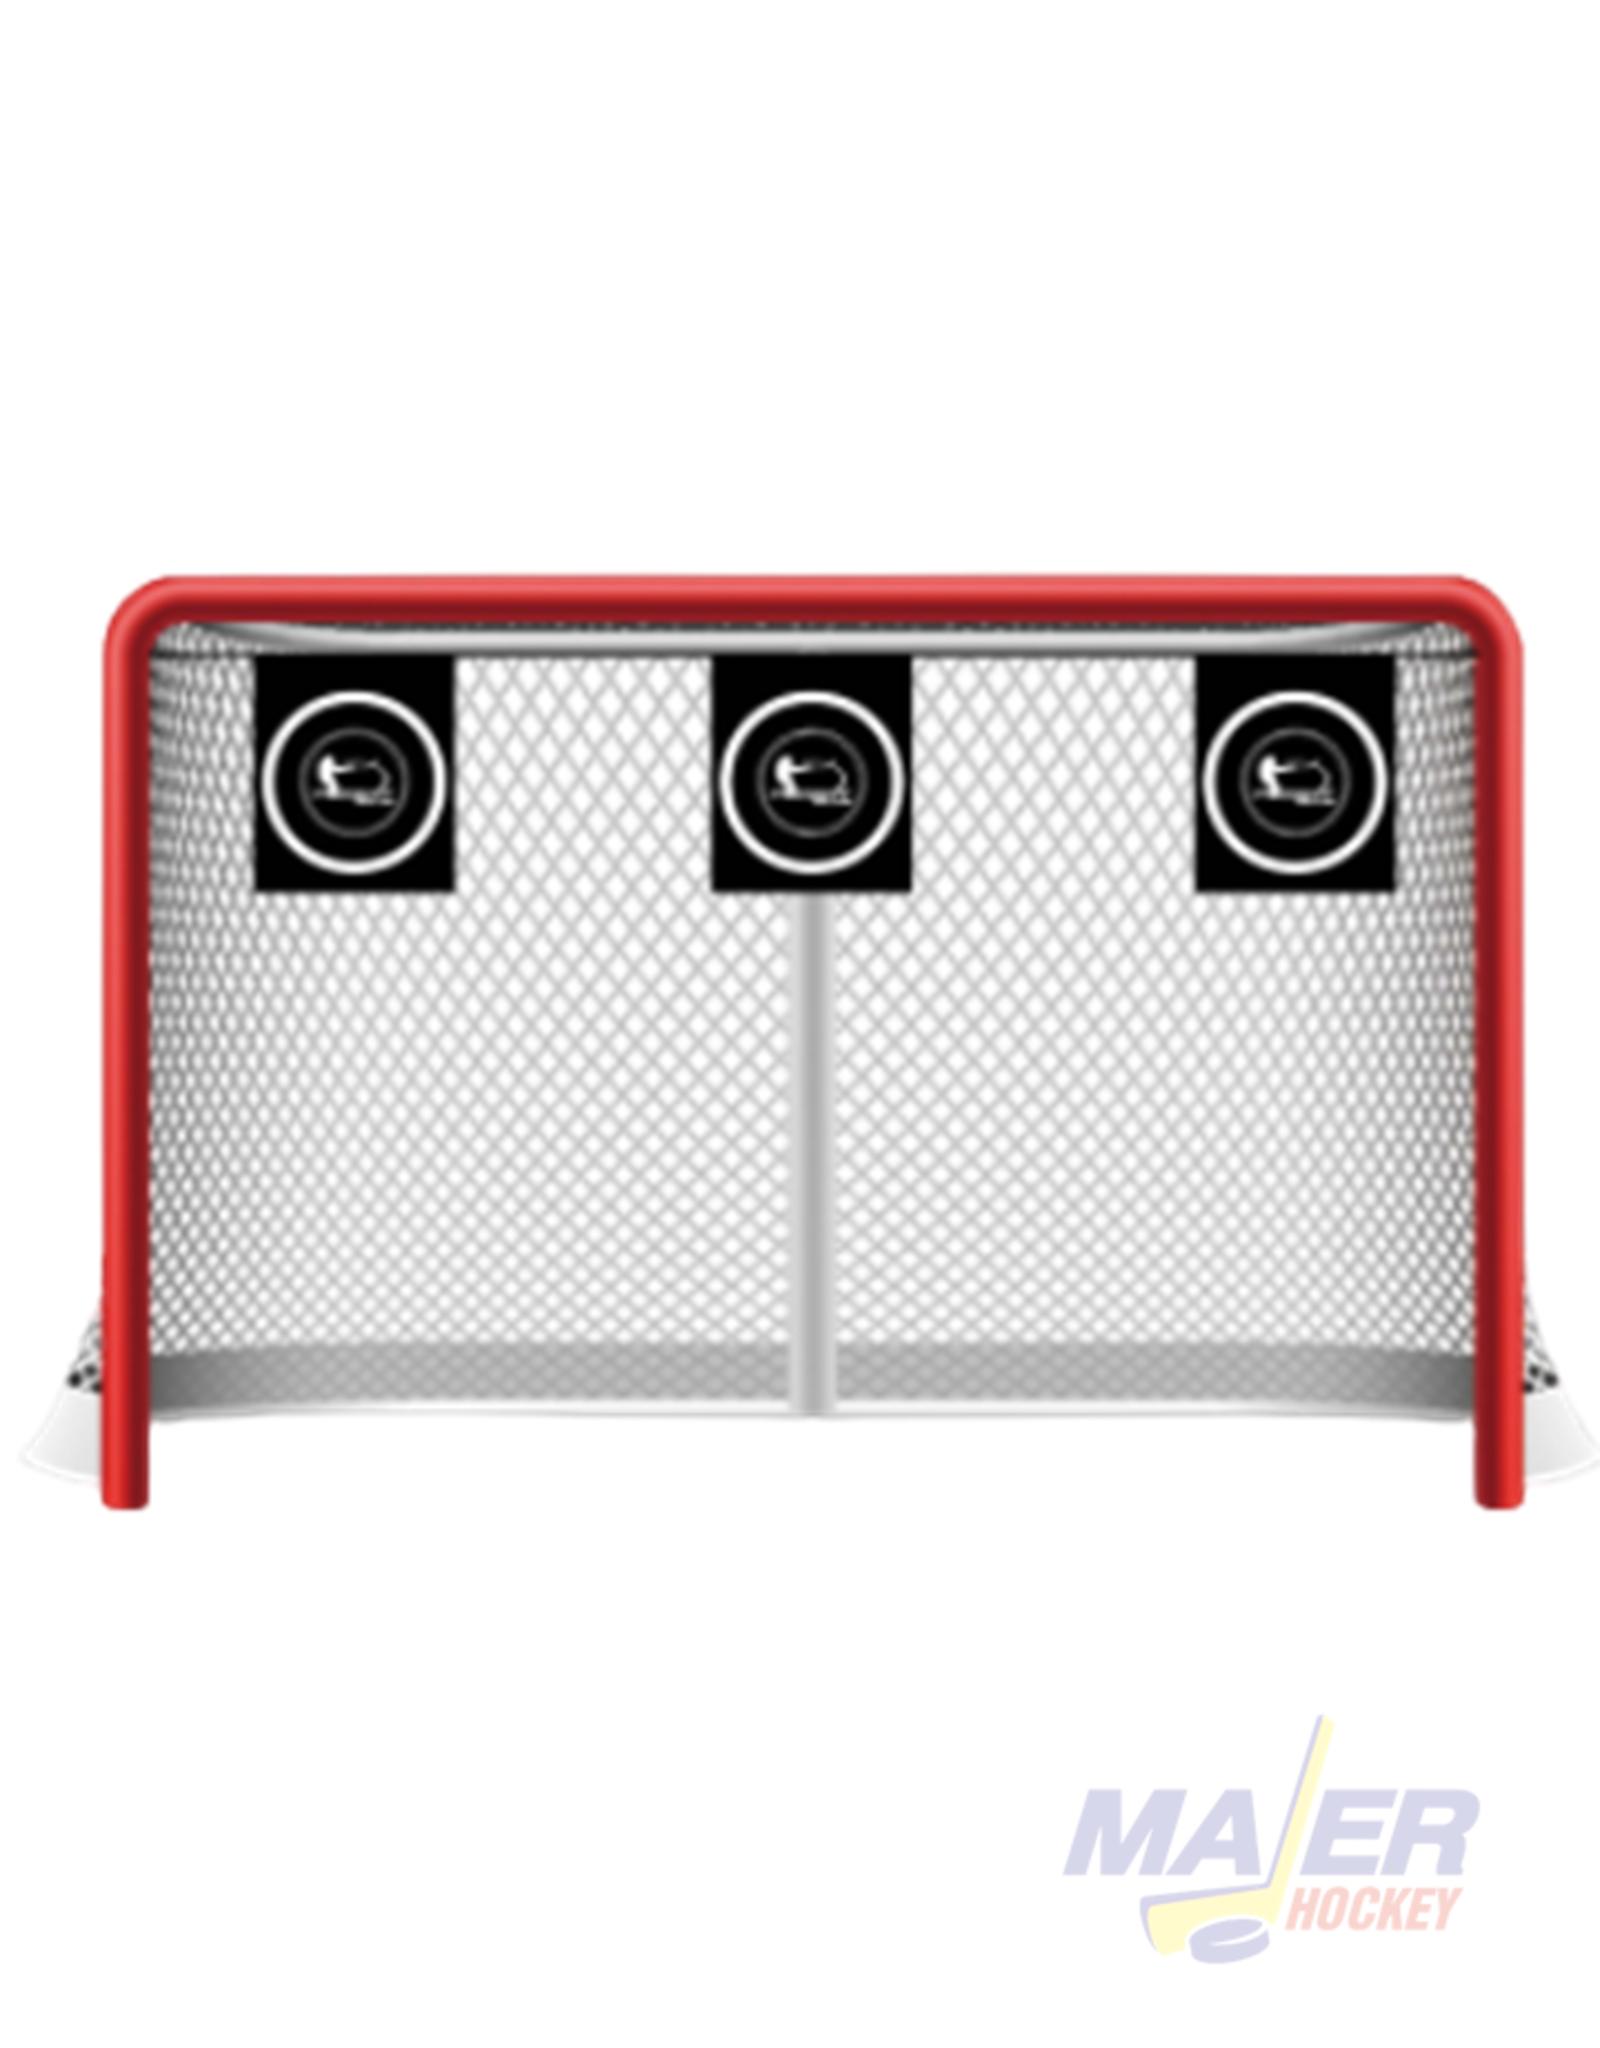 Potent Hockey Hockey Shooting Targets